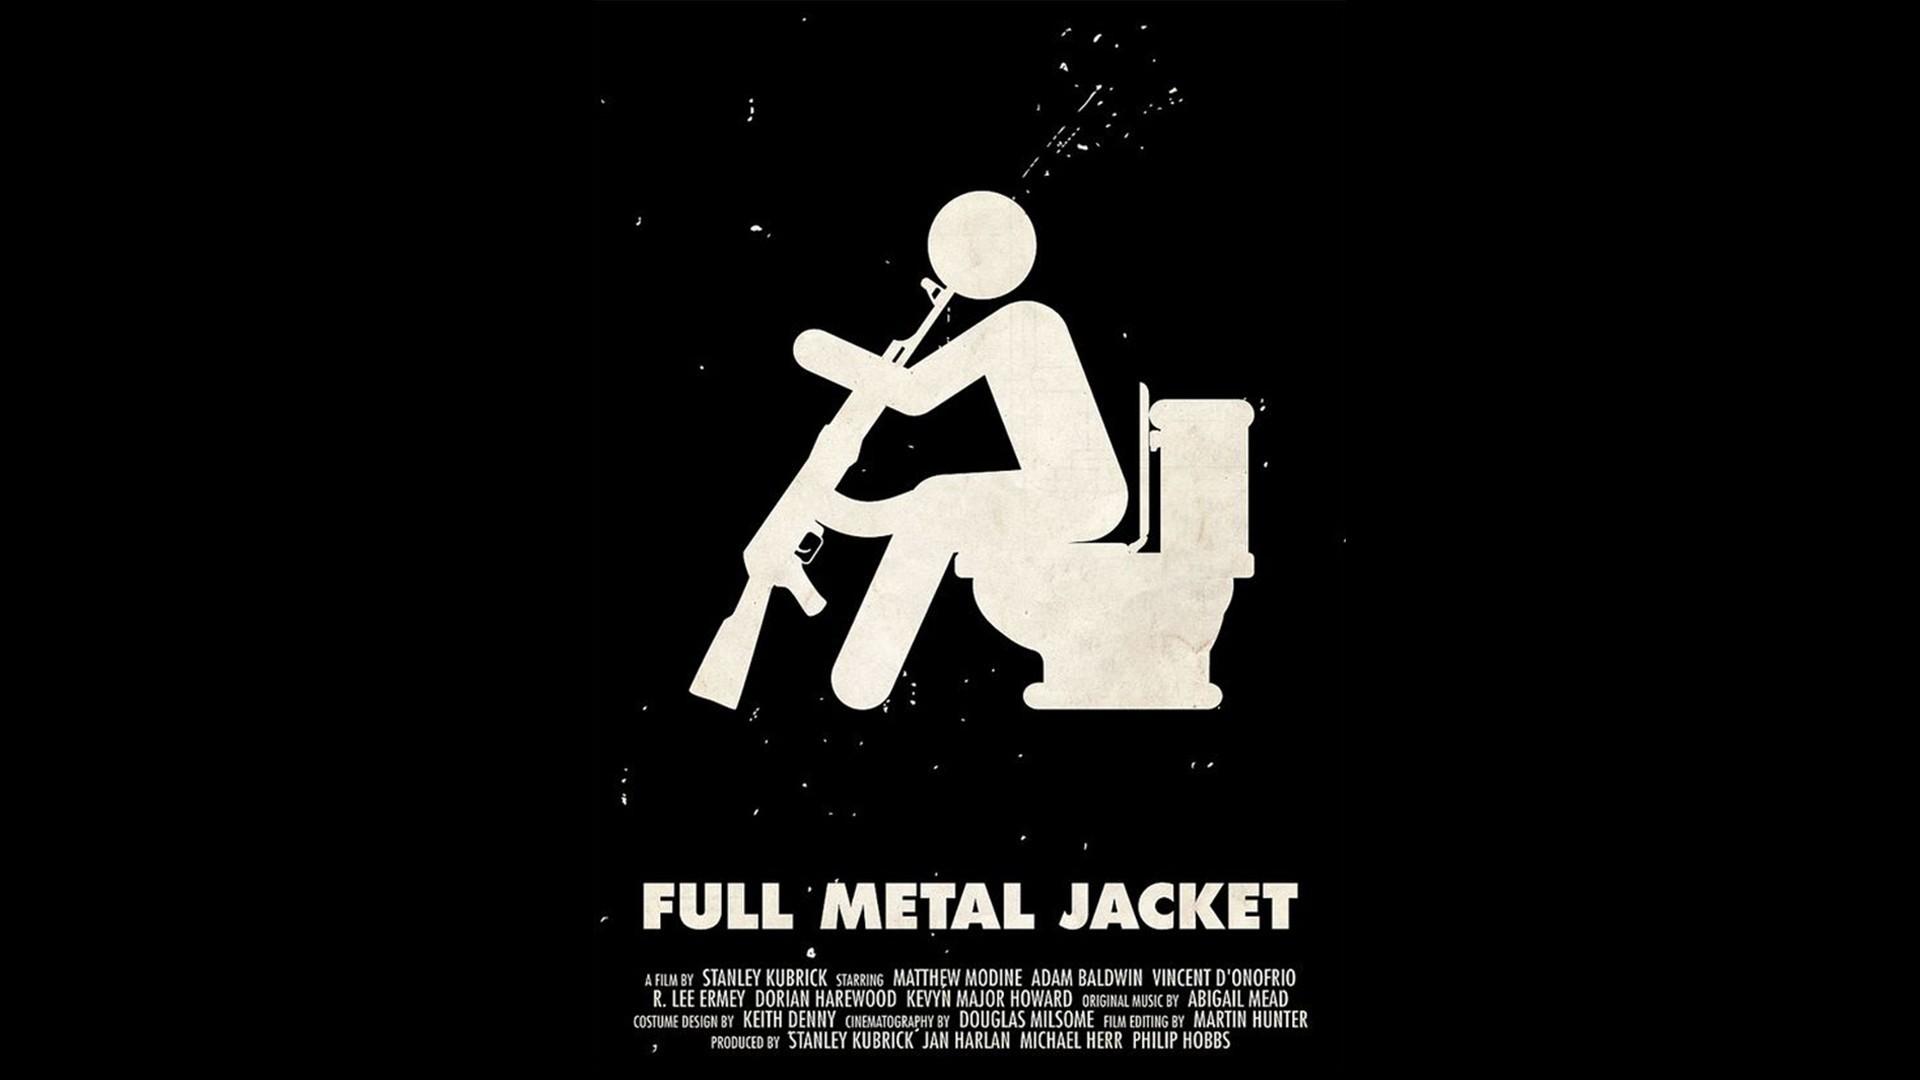 Full Metal Jacket Movie Hd Wallpaper - Full Metal Jacket Art , HD Wallpaper & Backgrounds